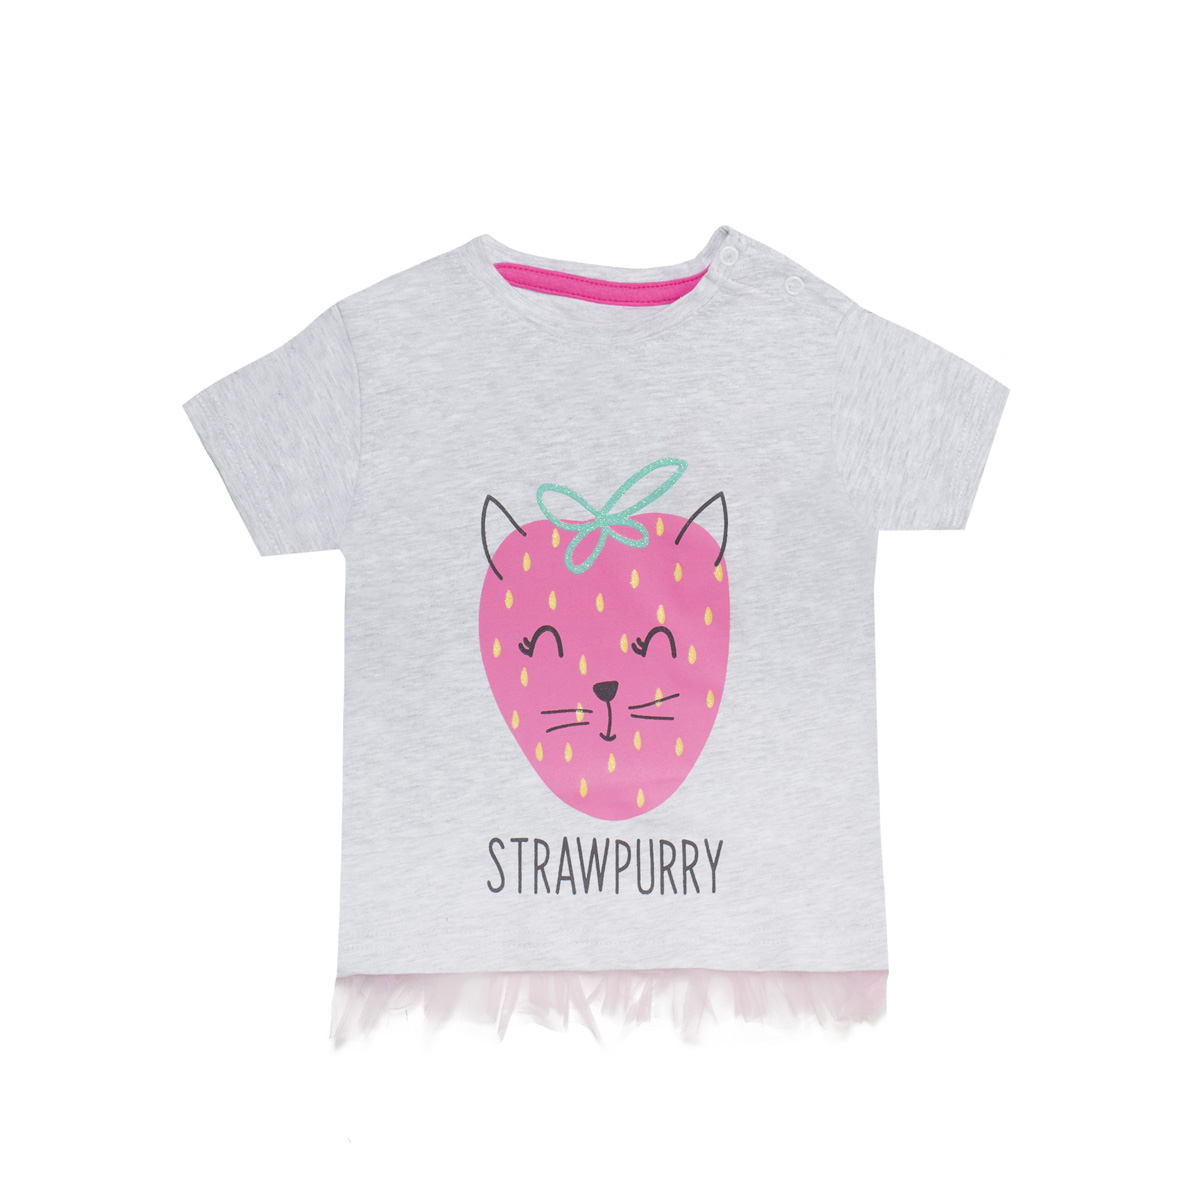 Baby majica, melange siva